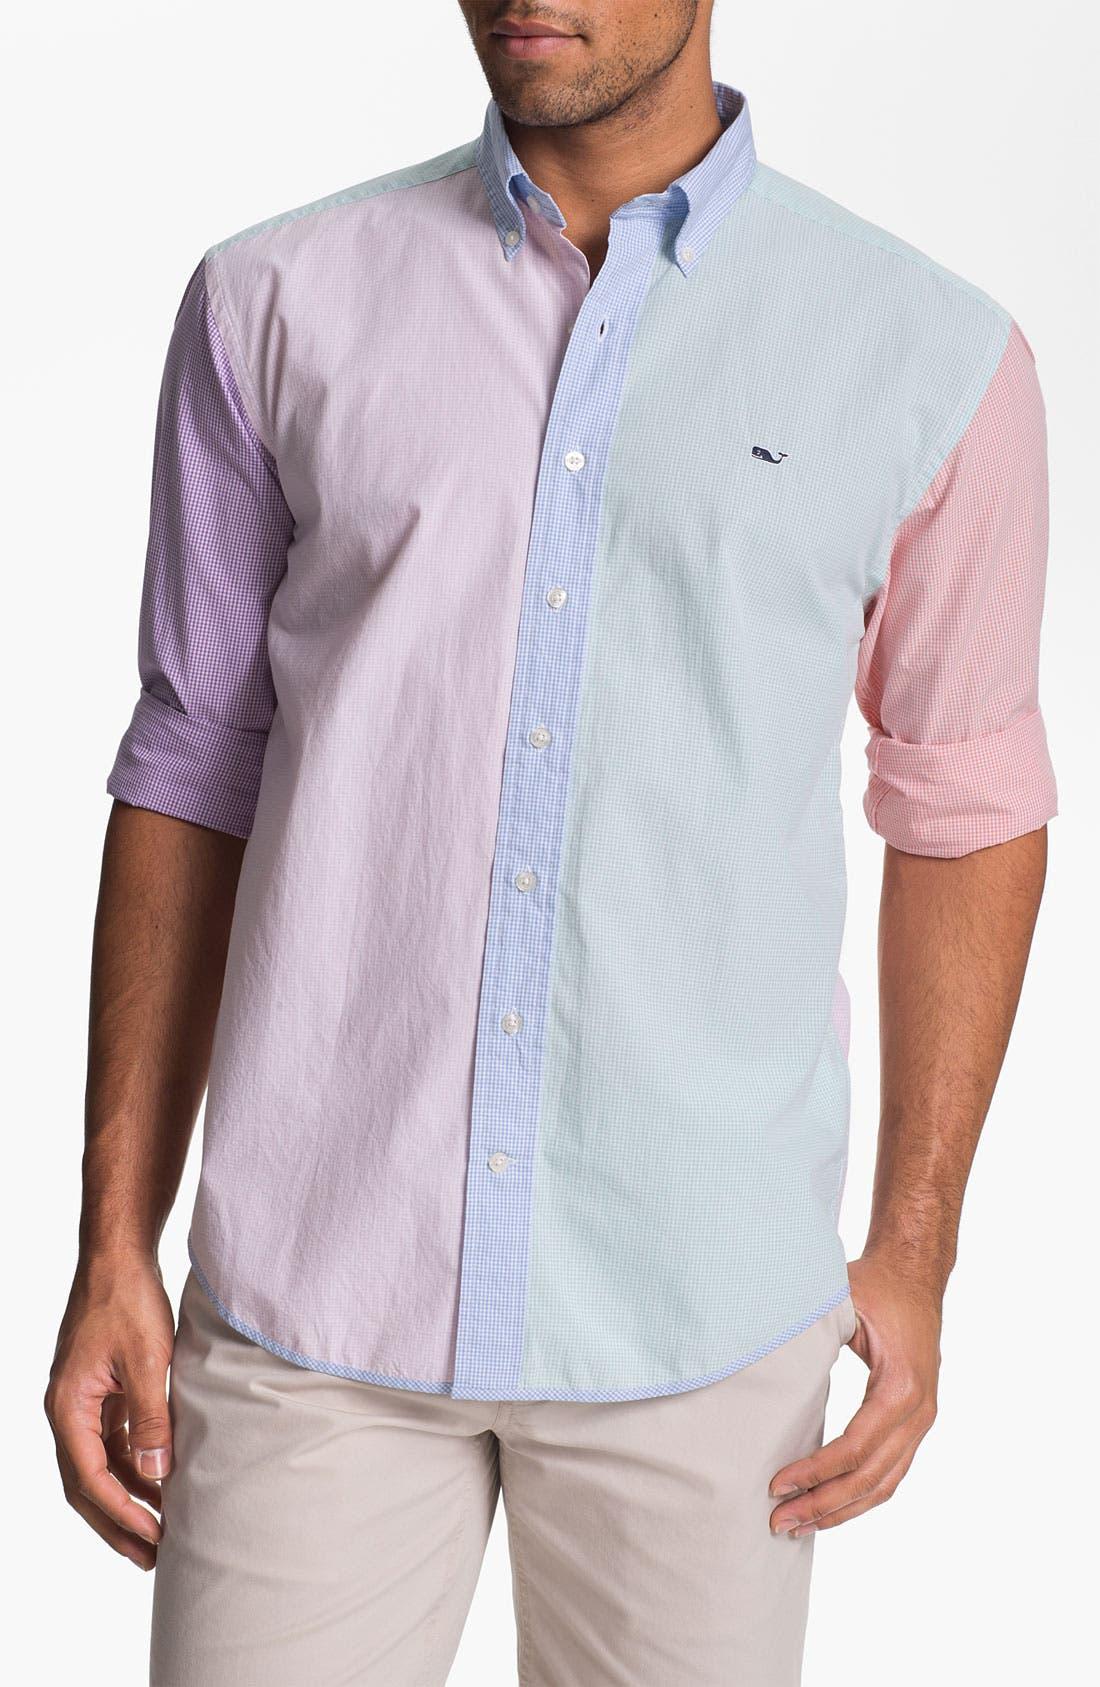 Main Image - Vineyard Vines 'Party Antigua' Regular Fit Sport Shirt